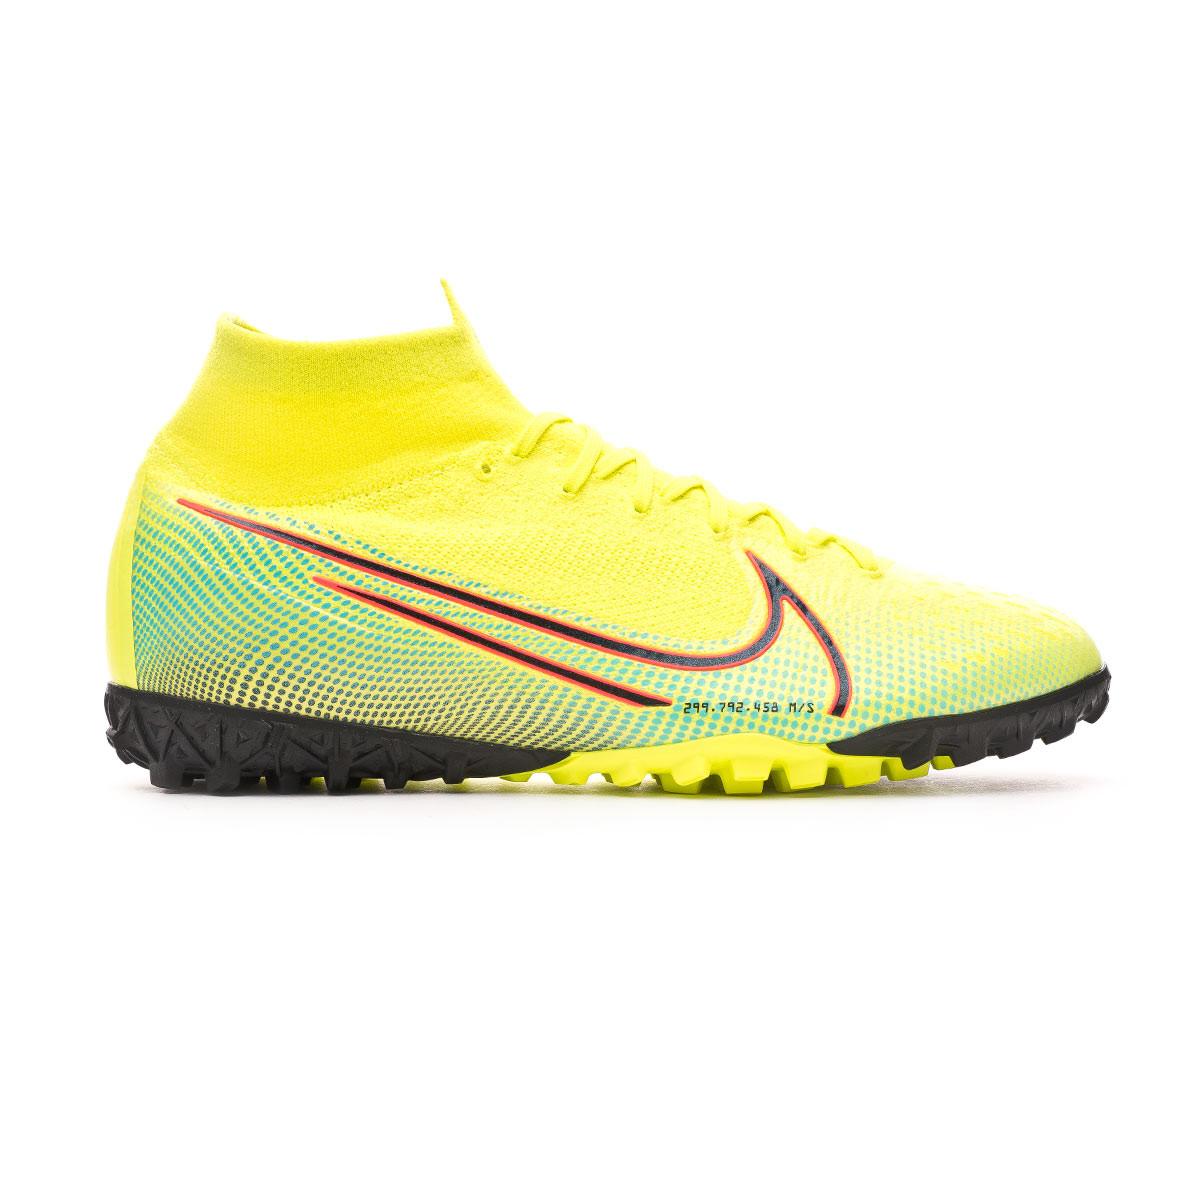 nike mercurial astro turf football boots